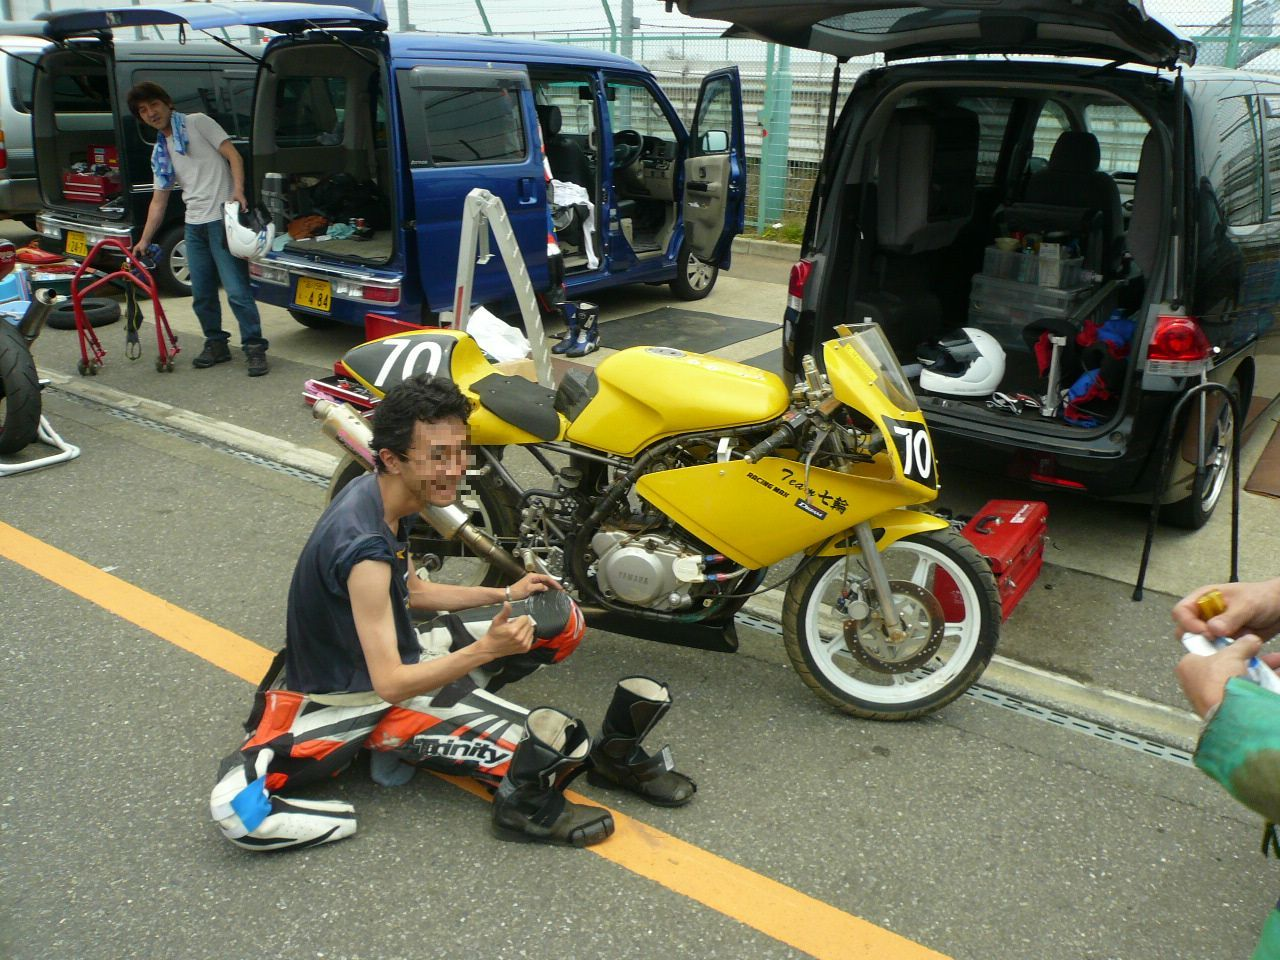 http://img.blogs.yahoo.co.jp/ybi/1/13/f5/tetsutaro499/folder/420383/img_420383_48139290_6?1243879277